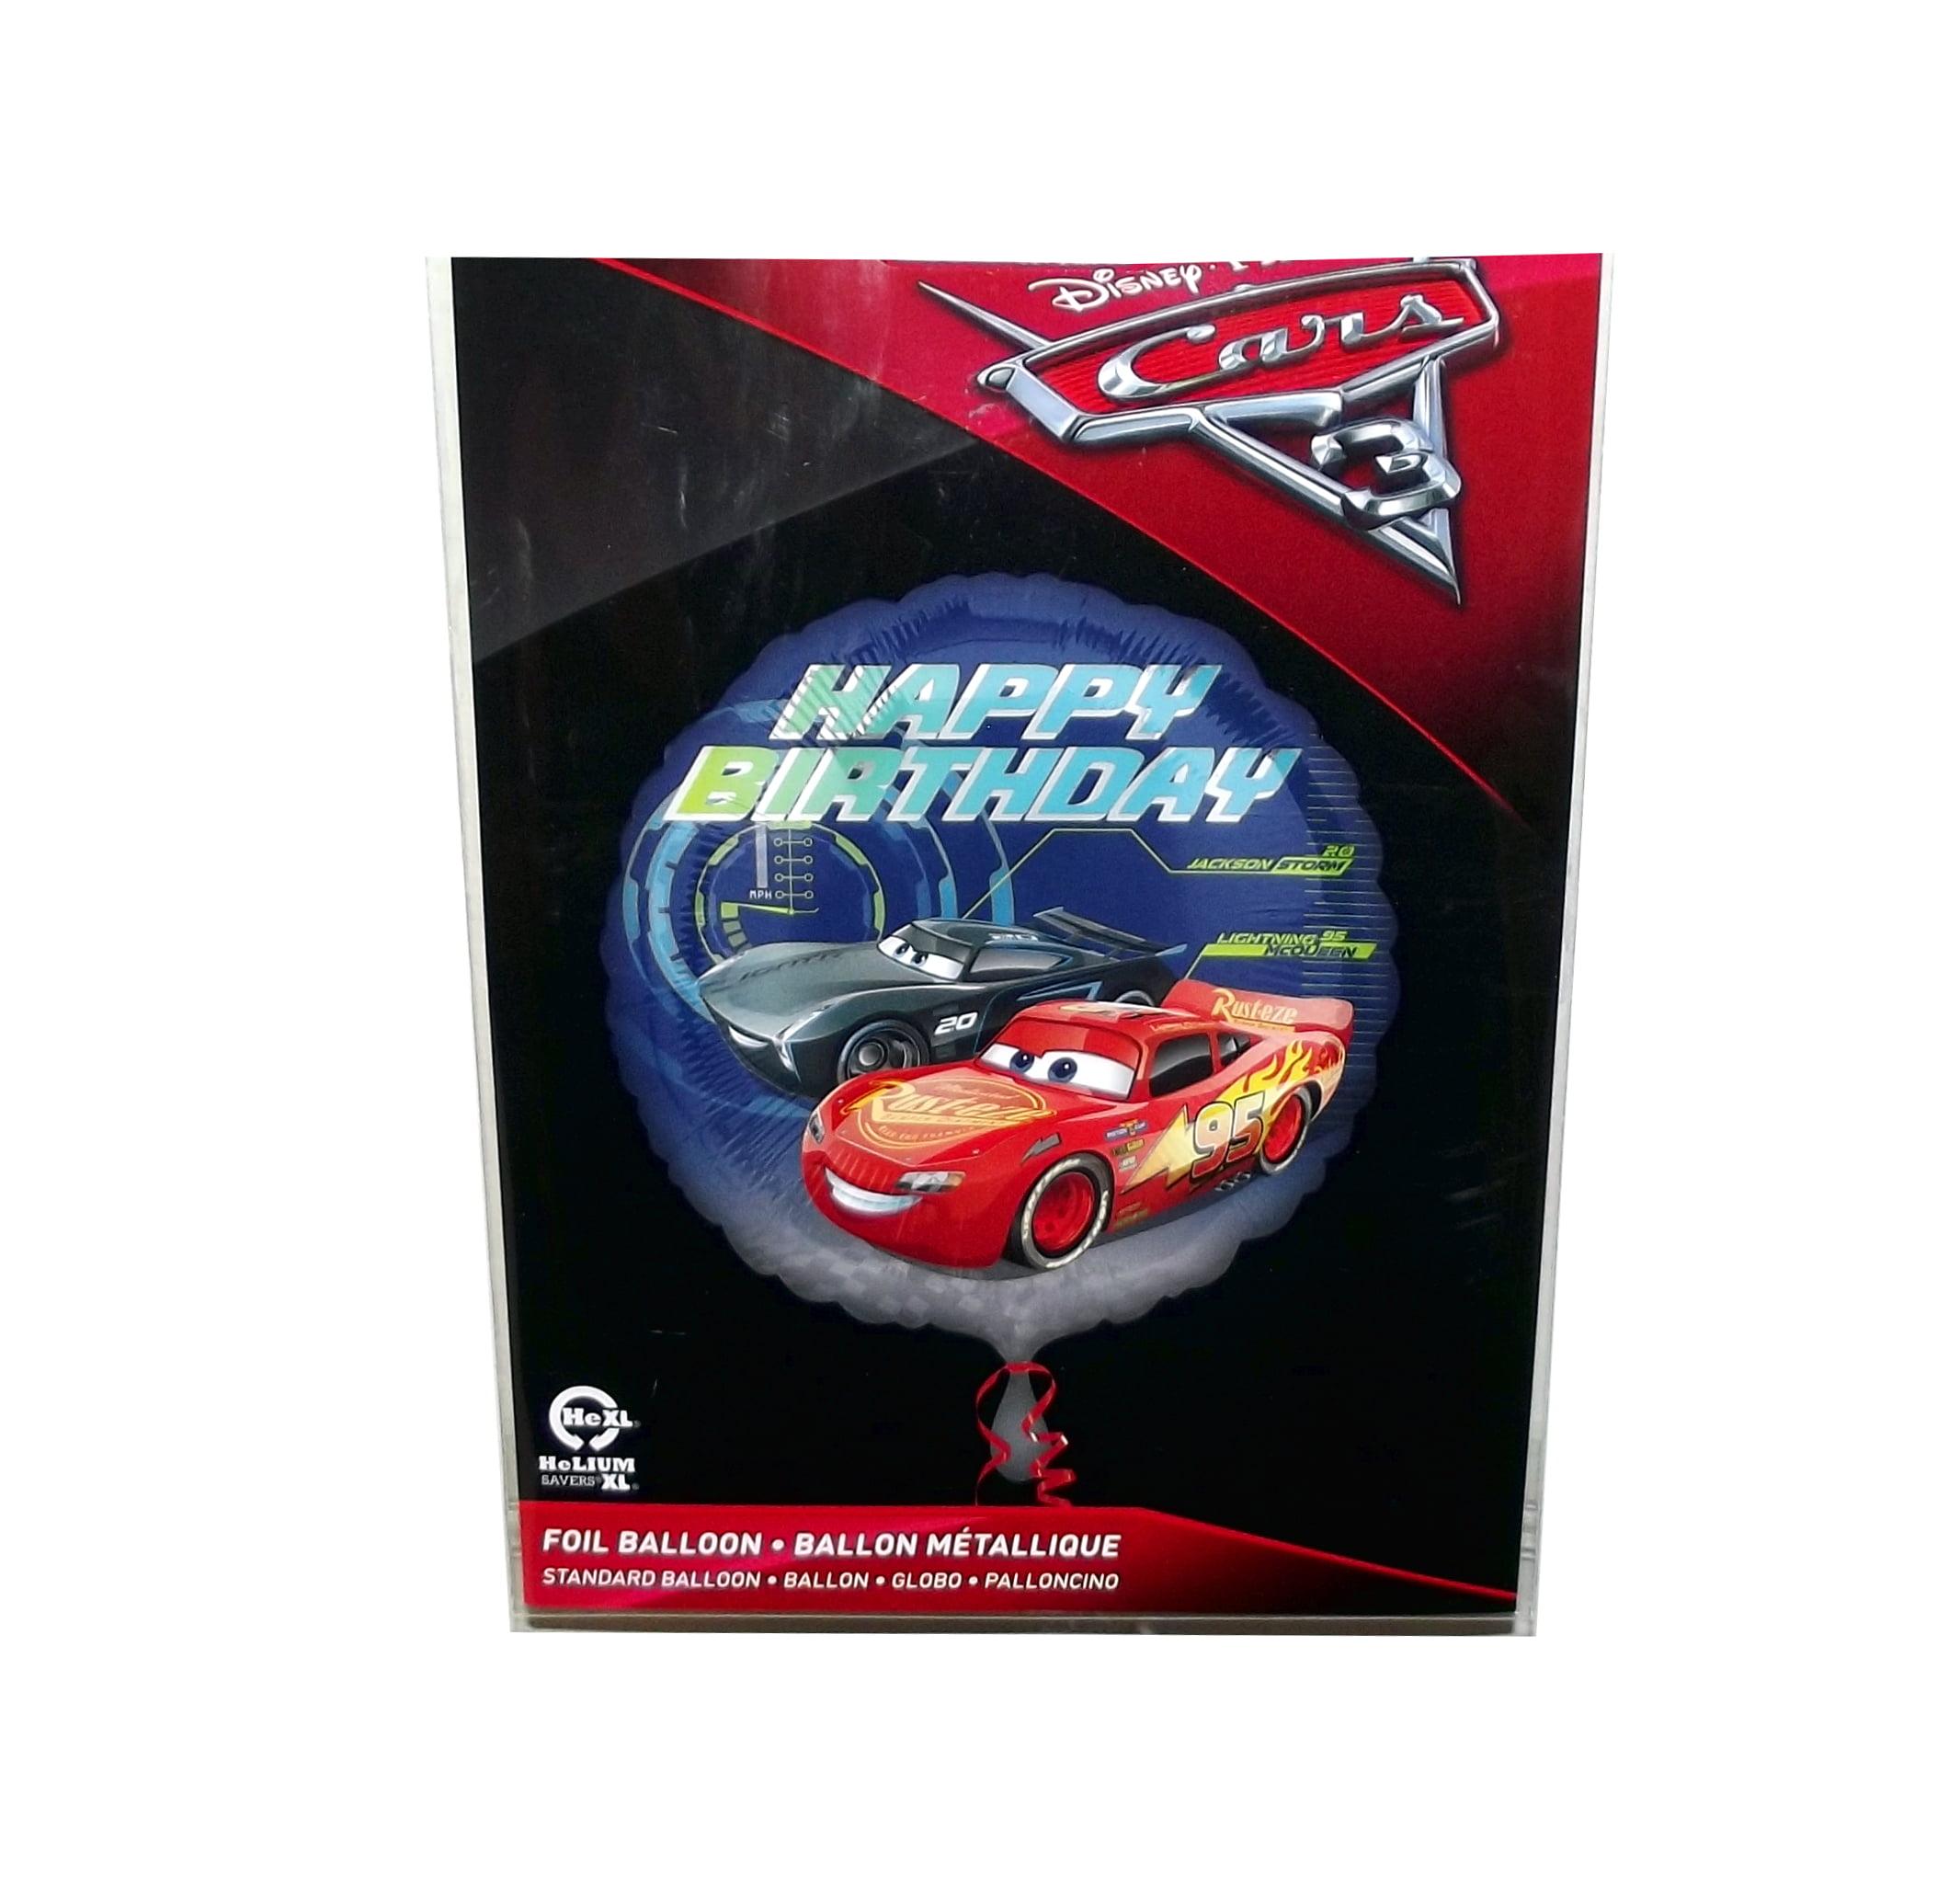 Anagram International Bouquet Cars 3 Lightning McQueen ANAGRAM INDUSTRIES 3536701